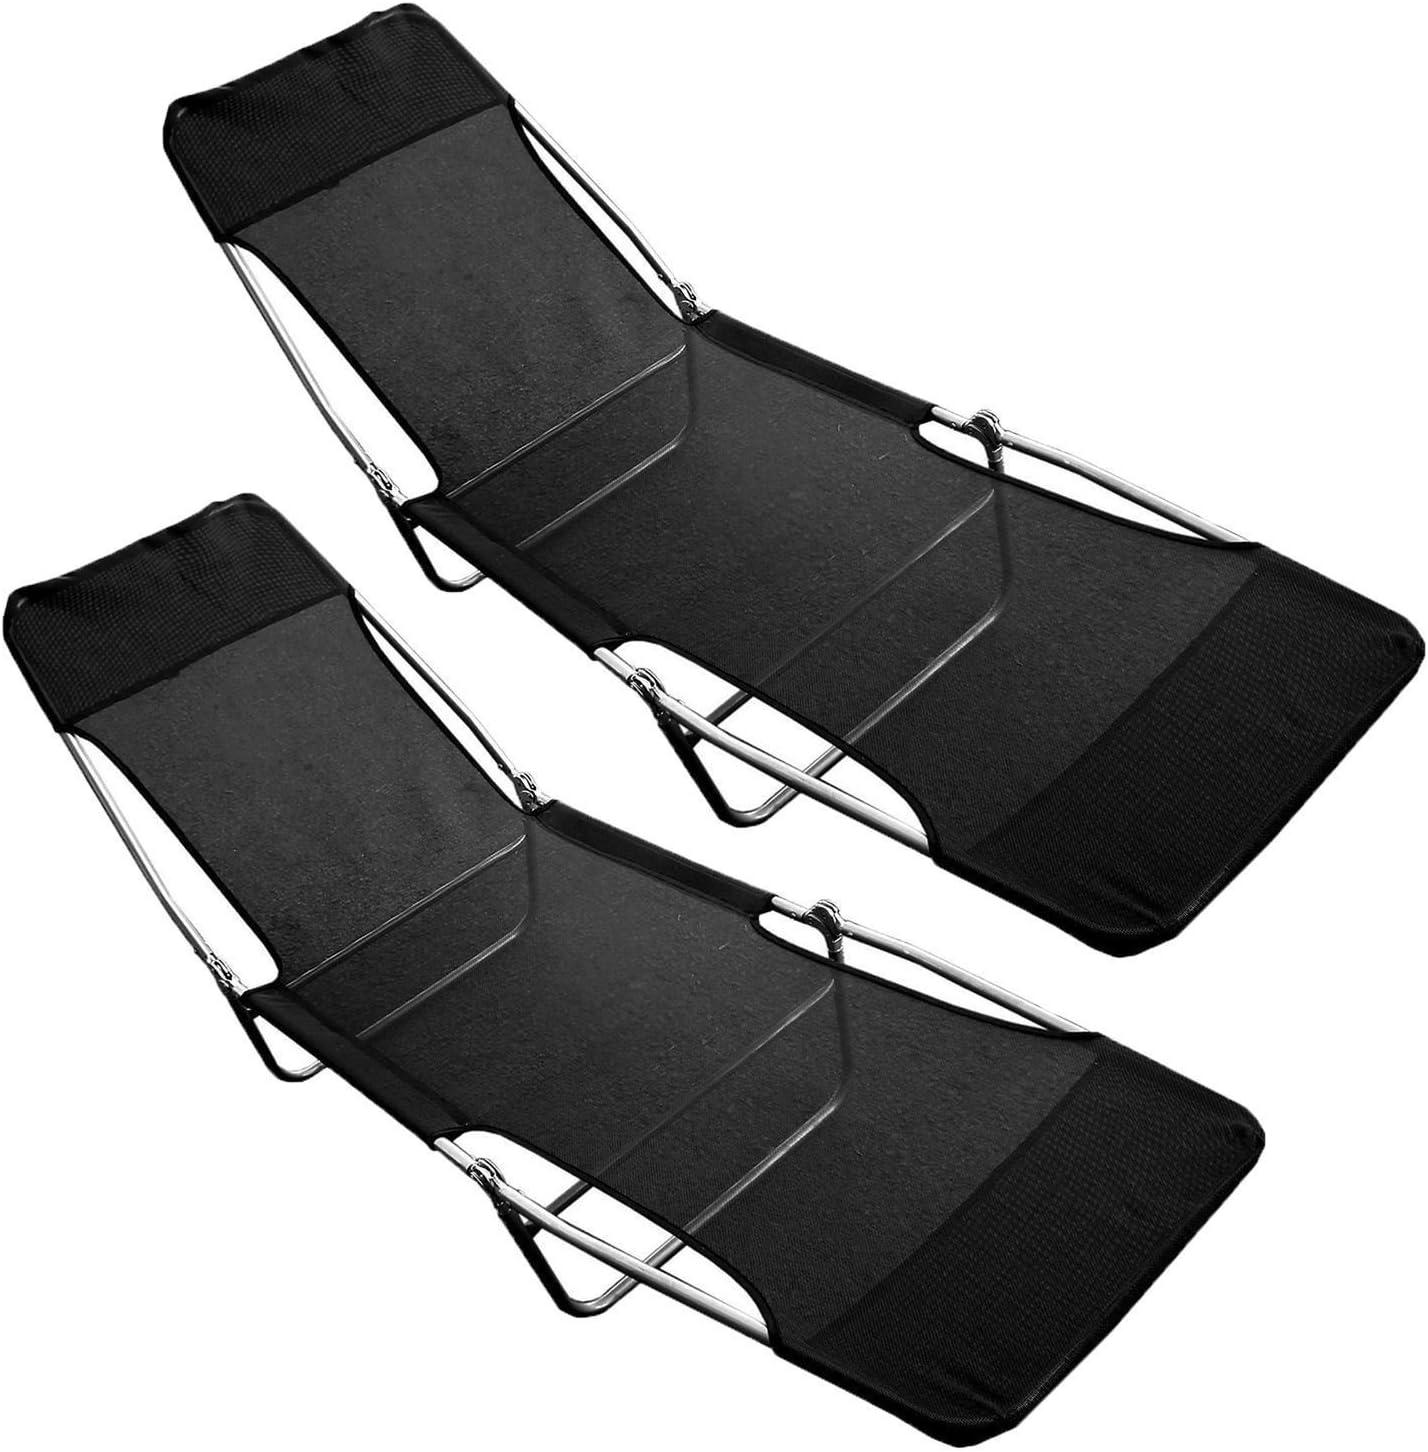 Pack de 2 plegable al aire libre jardín sun cama Textoline tumbona reclinable silla relajante New: Amazon.es: Jardín